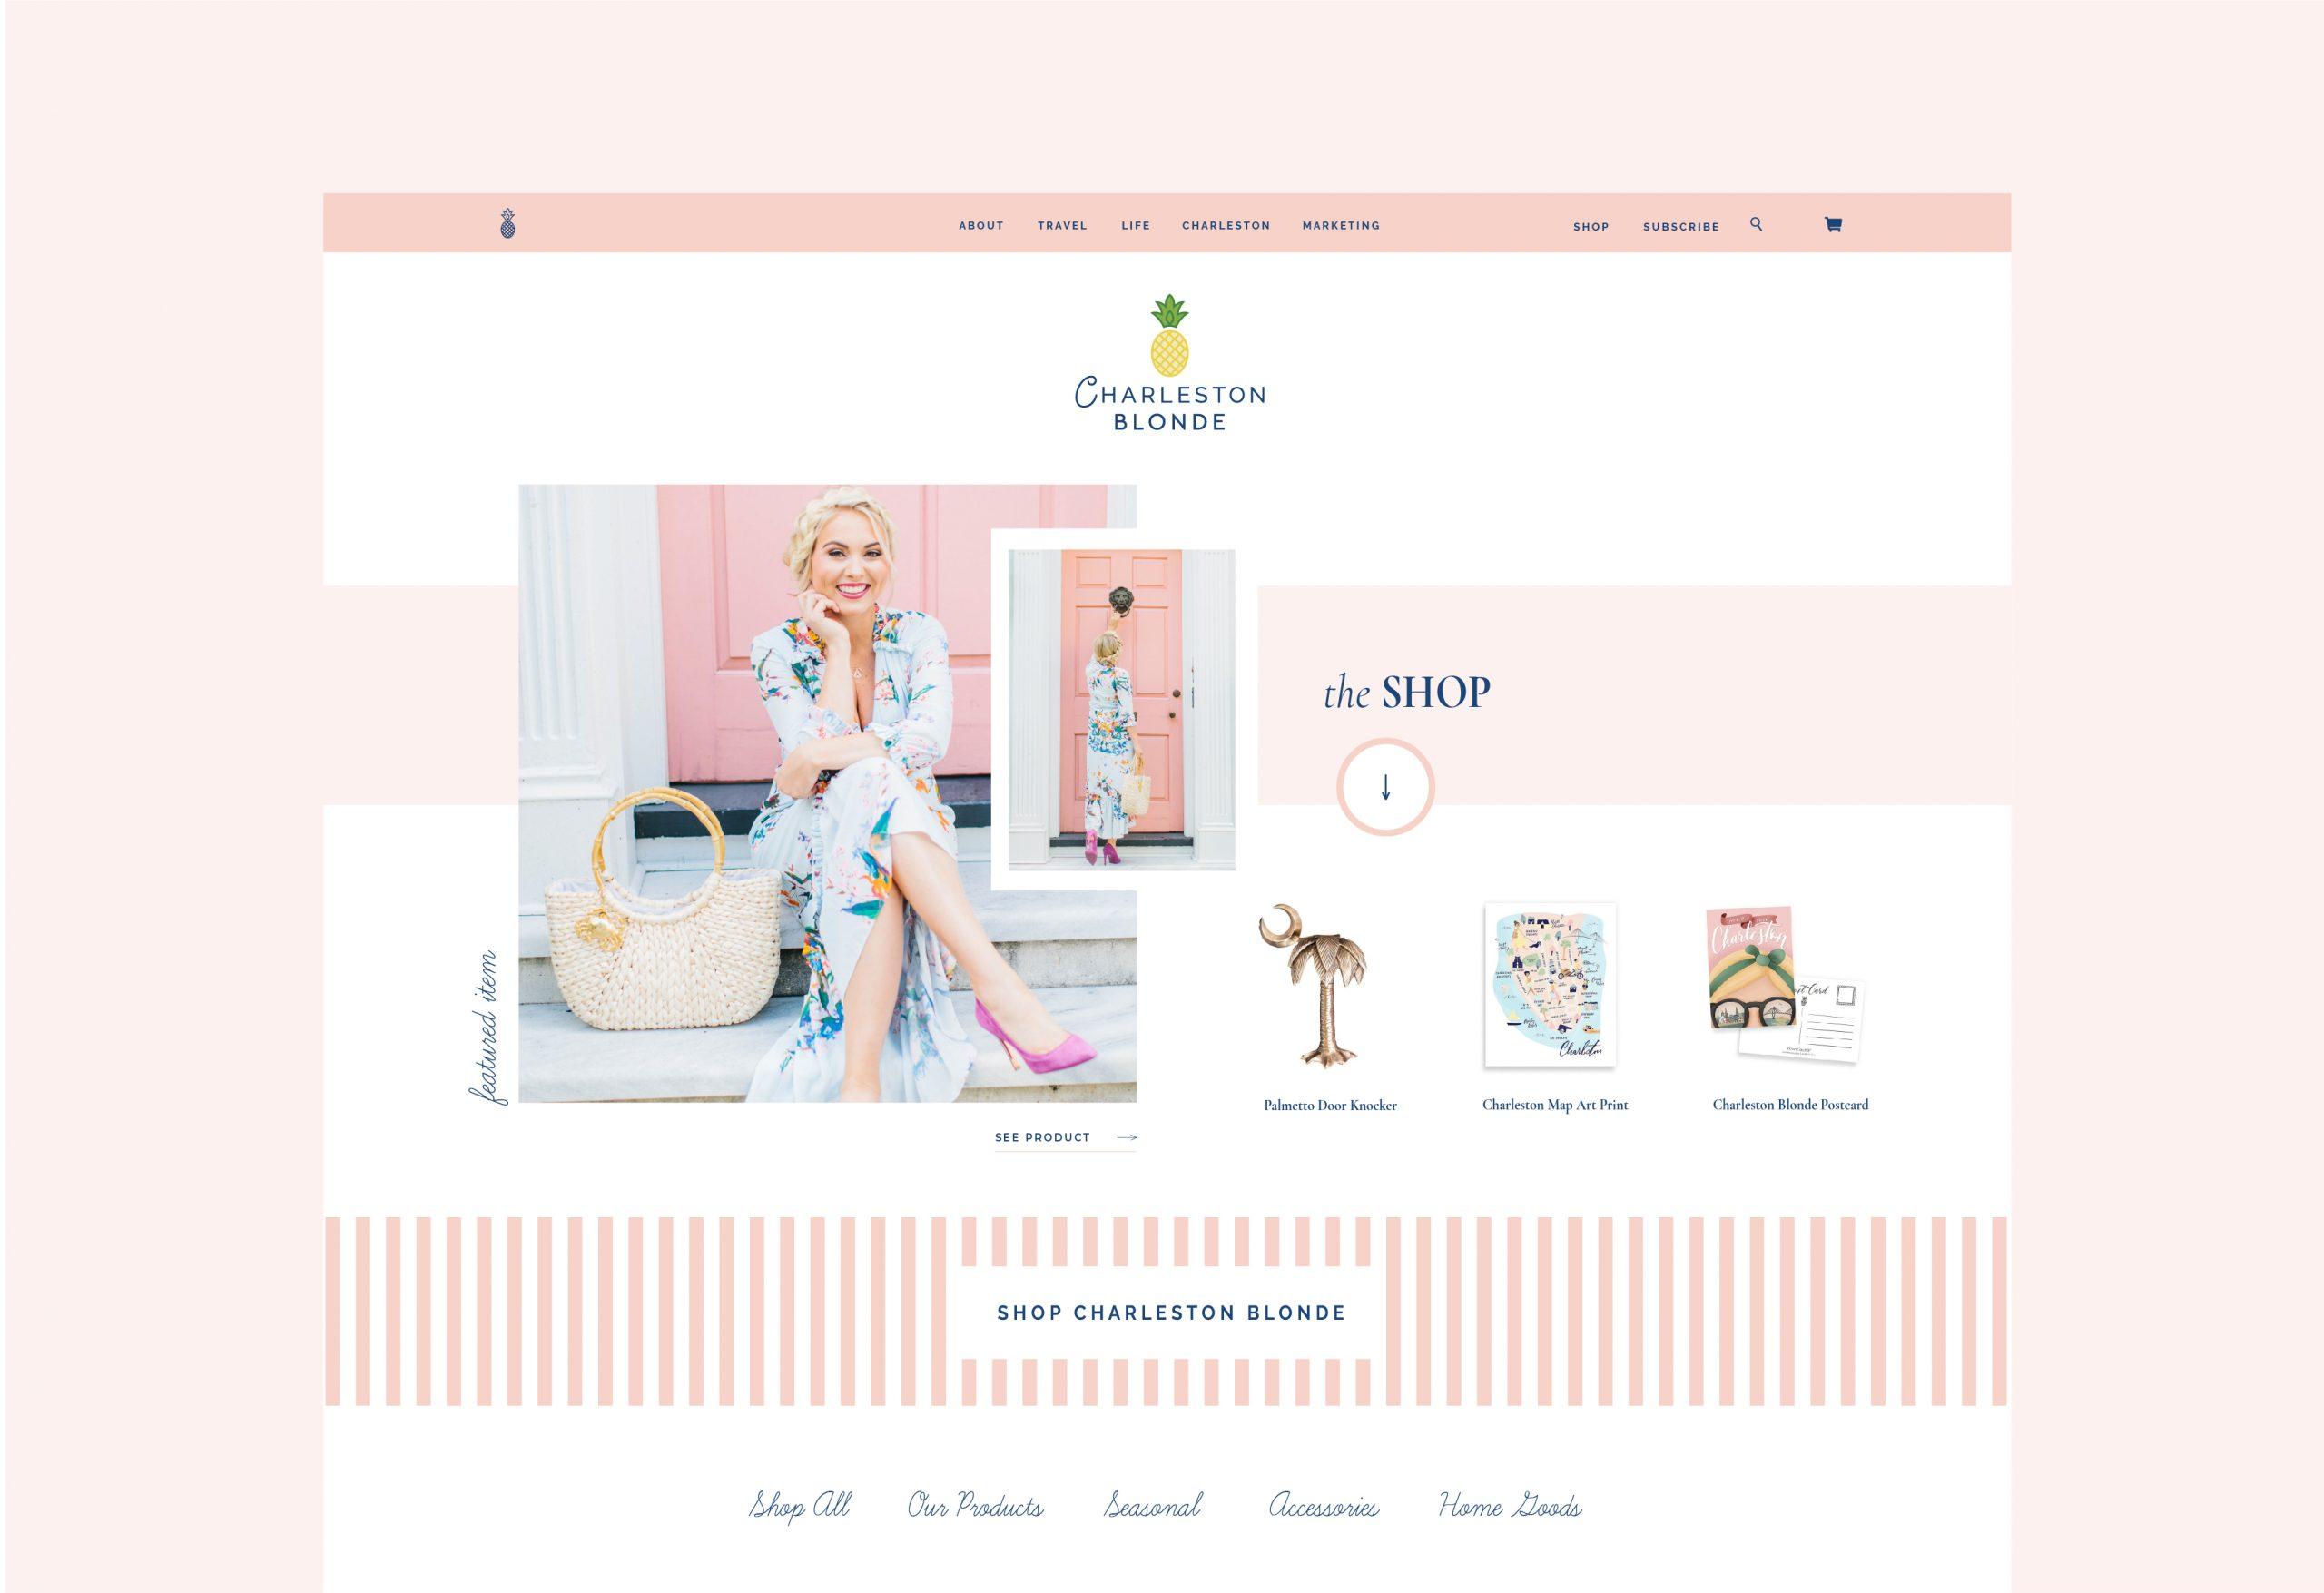 Charleston Blonde Blog Design by Studio 9 Co